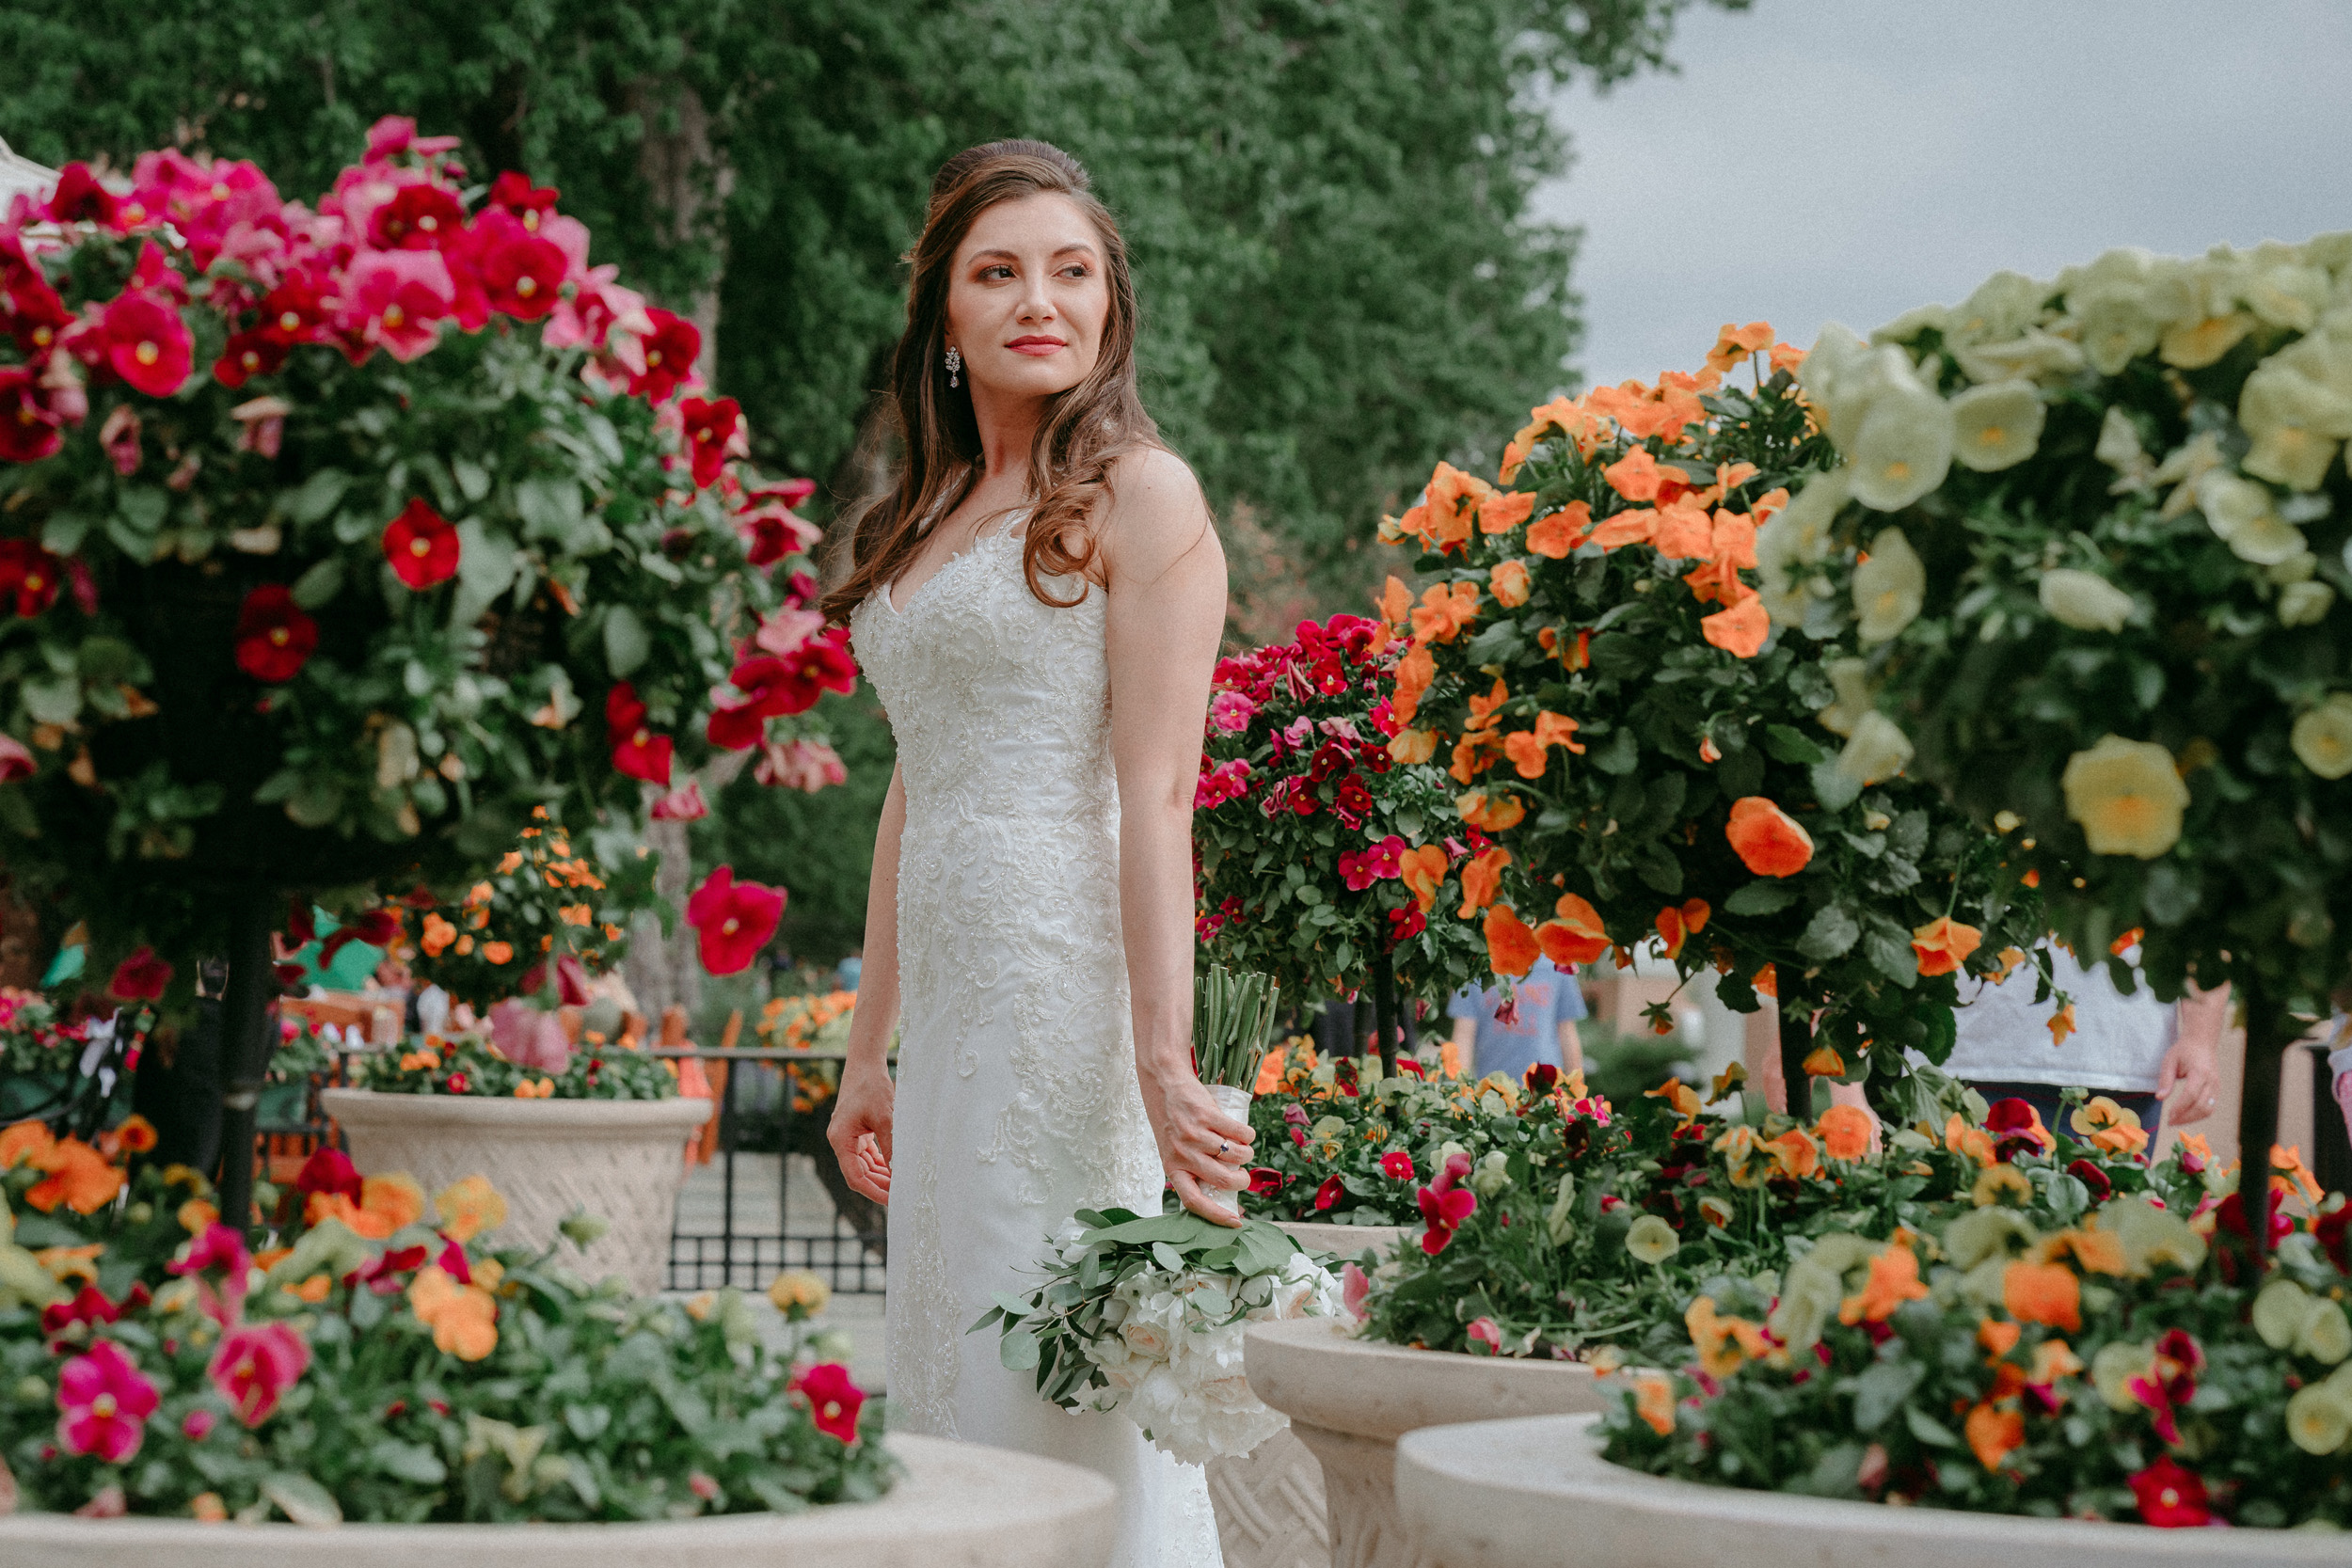 Broadmoor-Wedding-Photography-KC-024.jpg